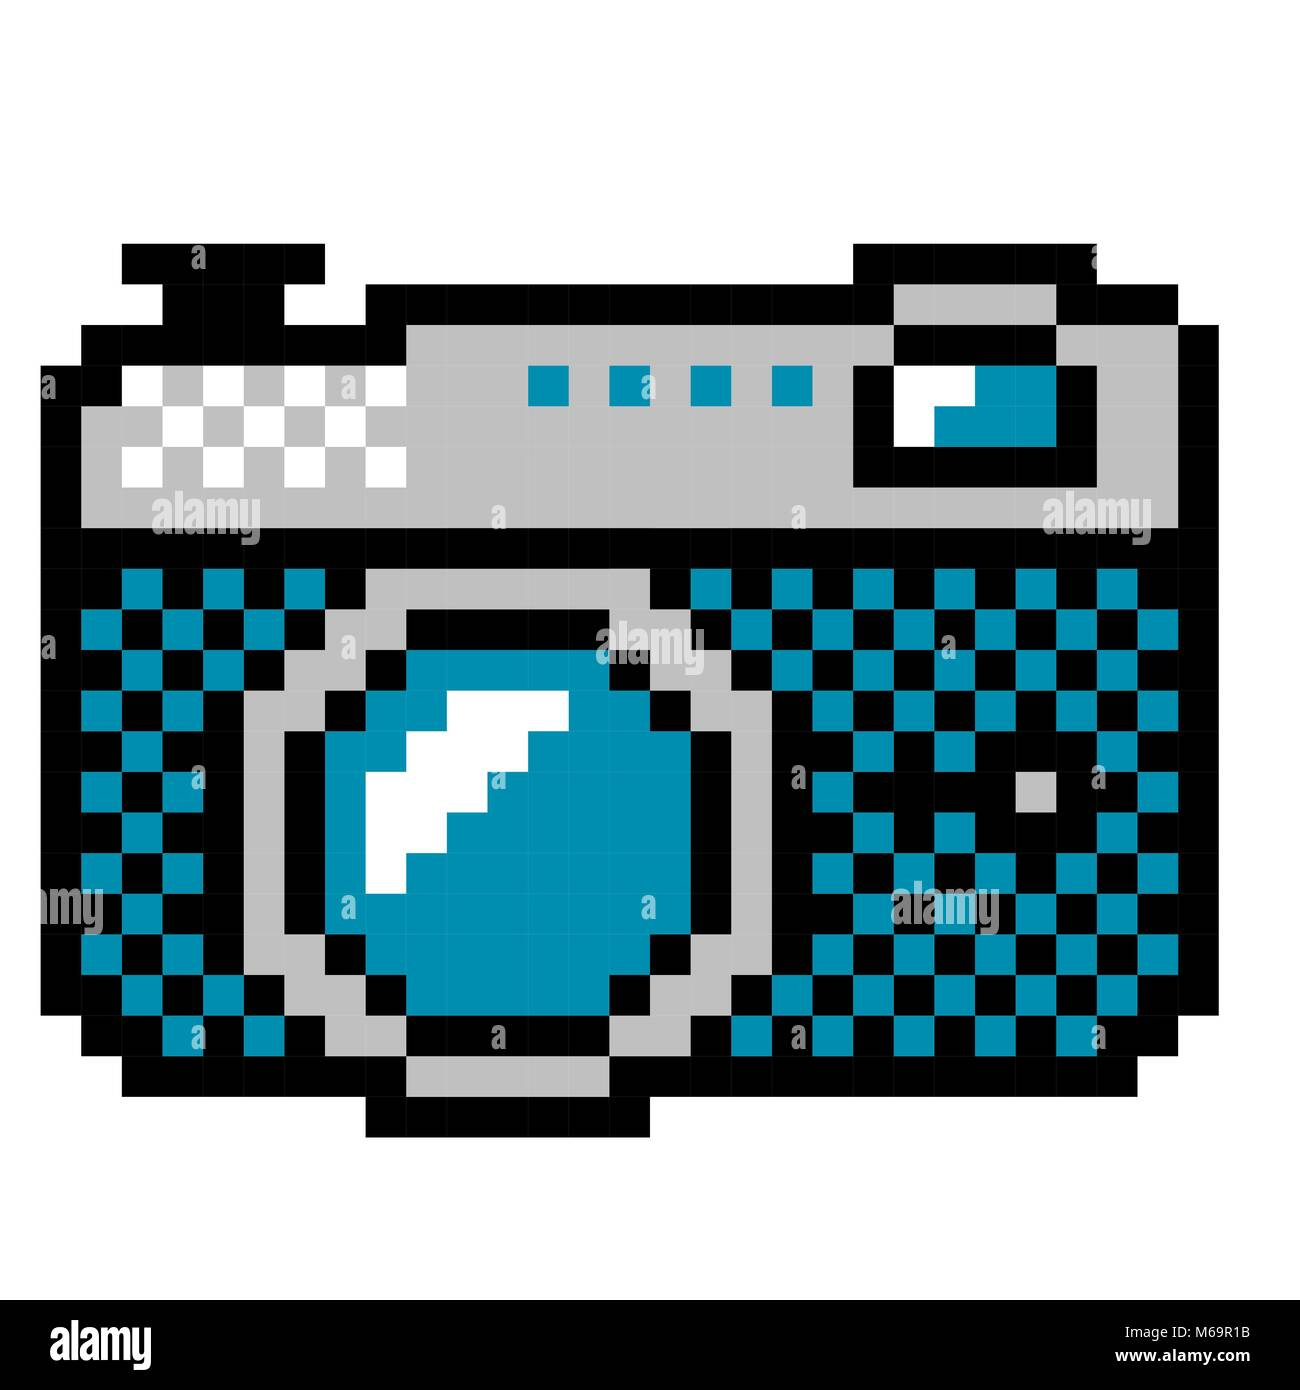 analog photo camera - vintage computer icon style Stock Vector